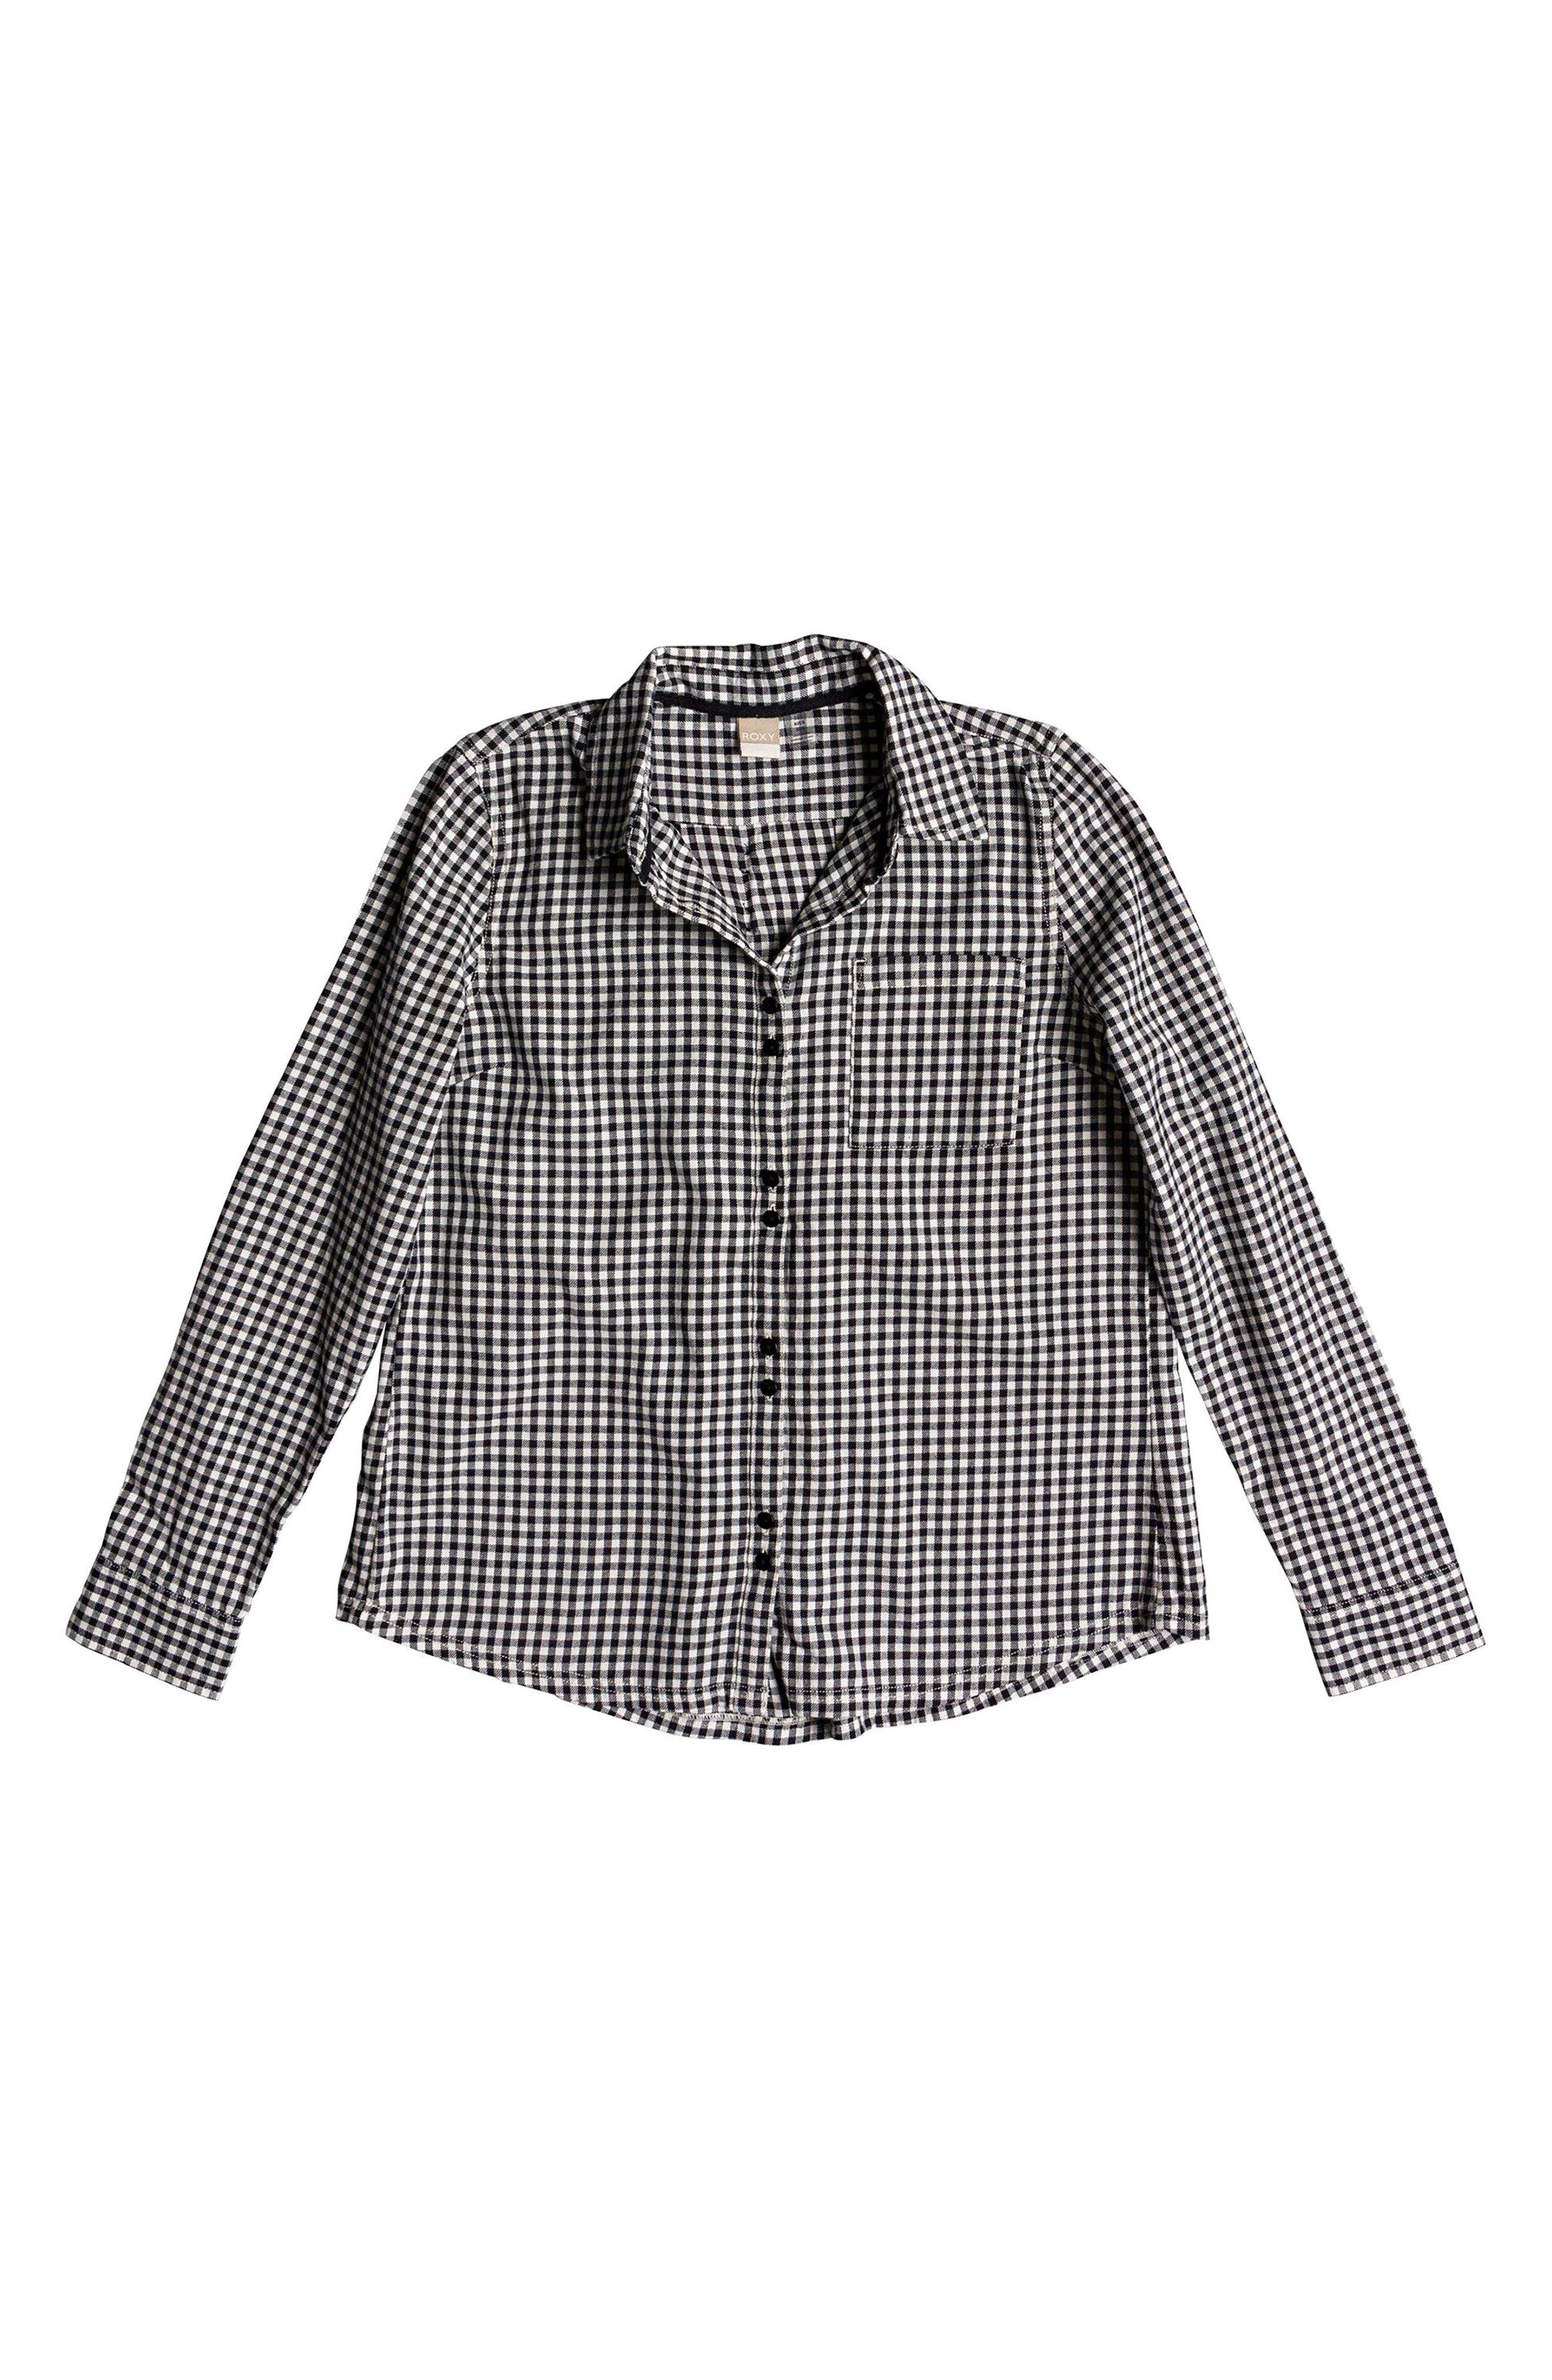 Concrete Streets Gingham Flannel Shirt,                             Alternate thumbnail 3, color,                             001